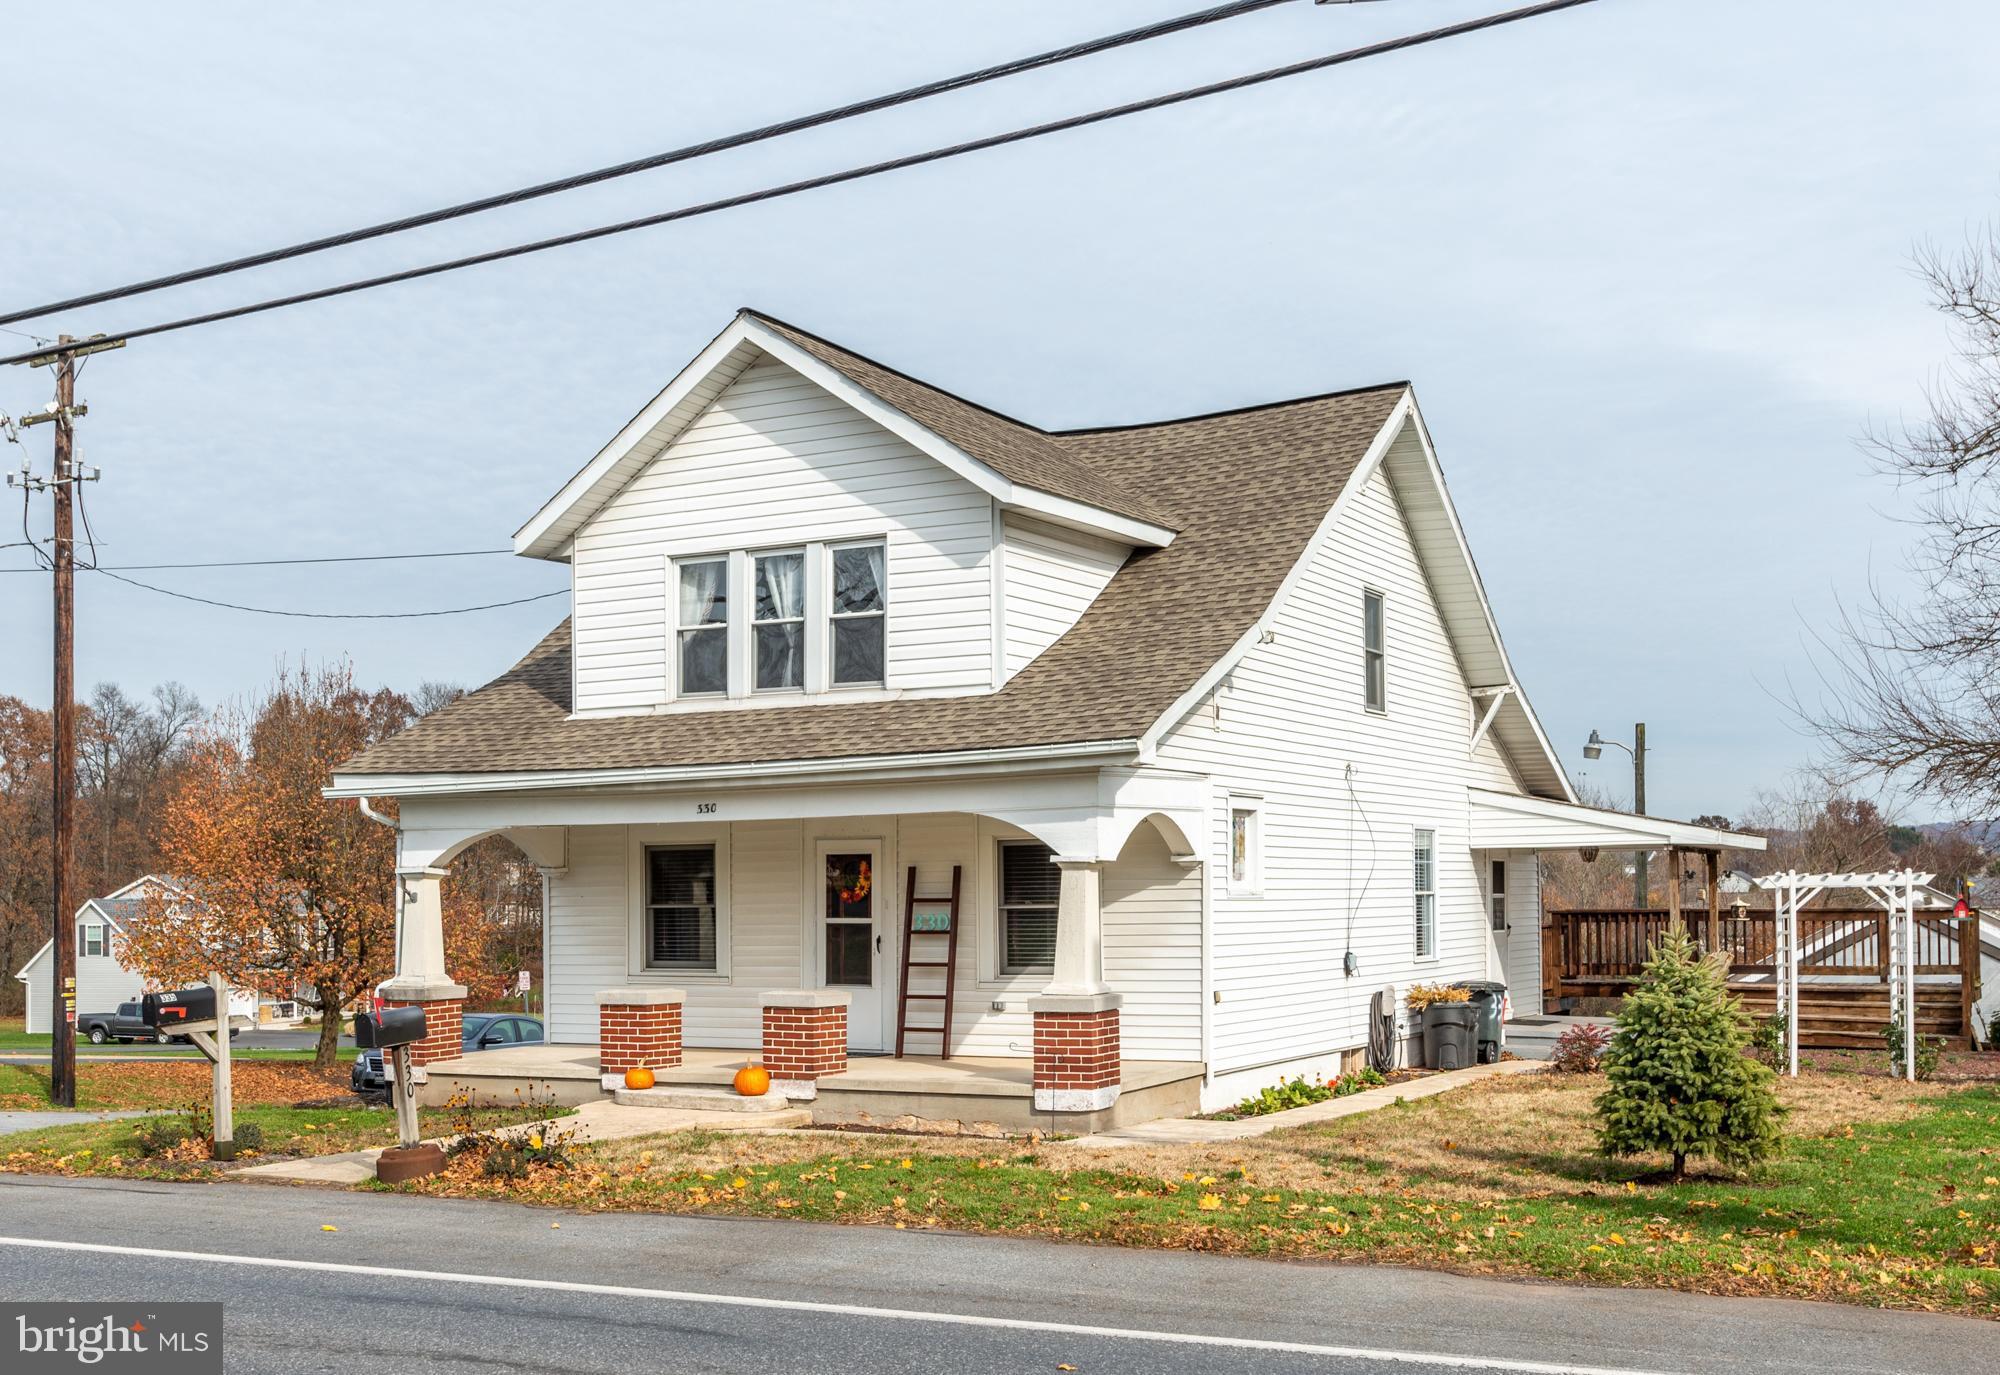 330 W MAIN STREET, REINHOLDS, PA 17569